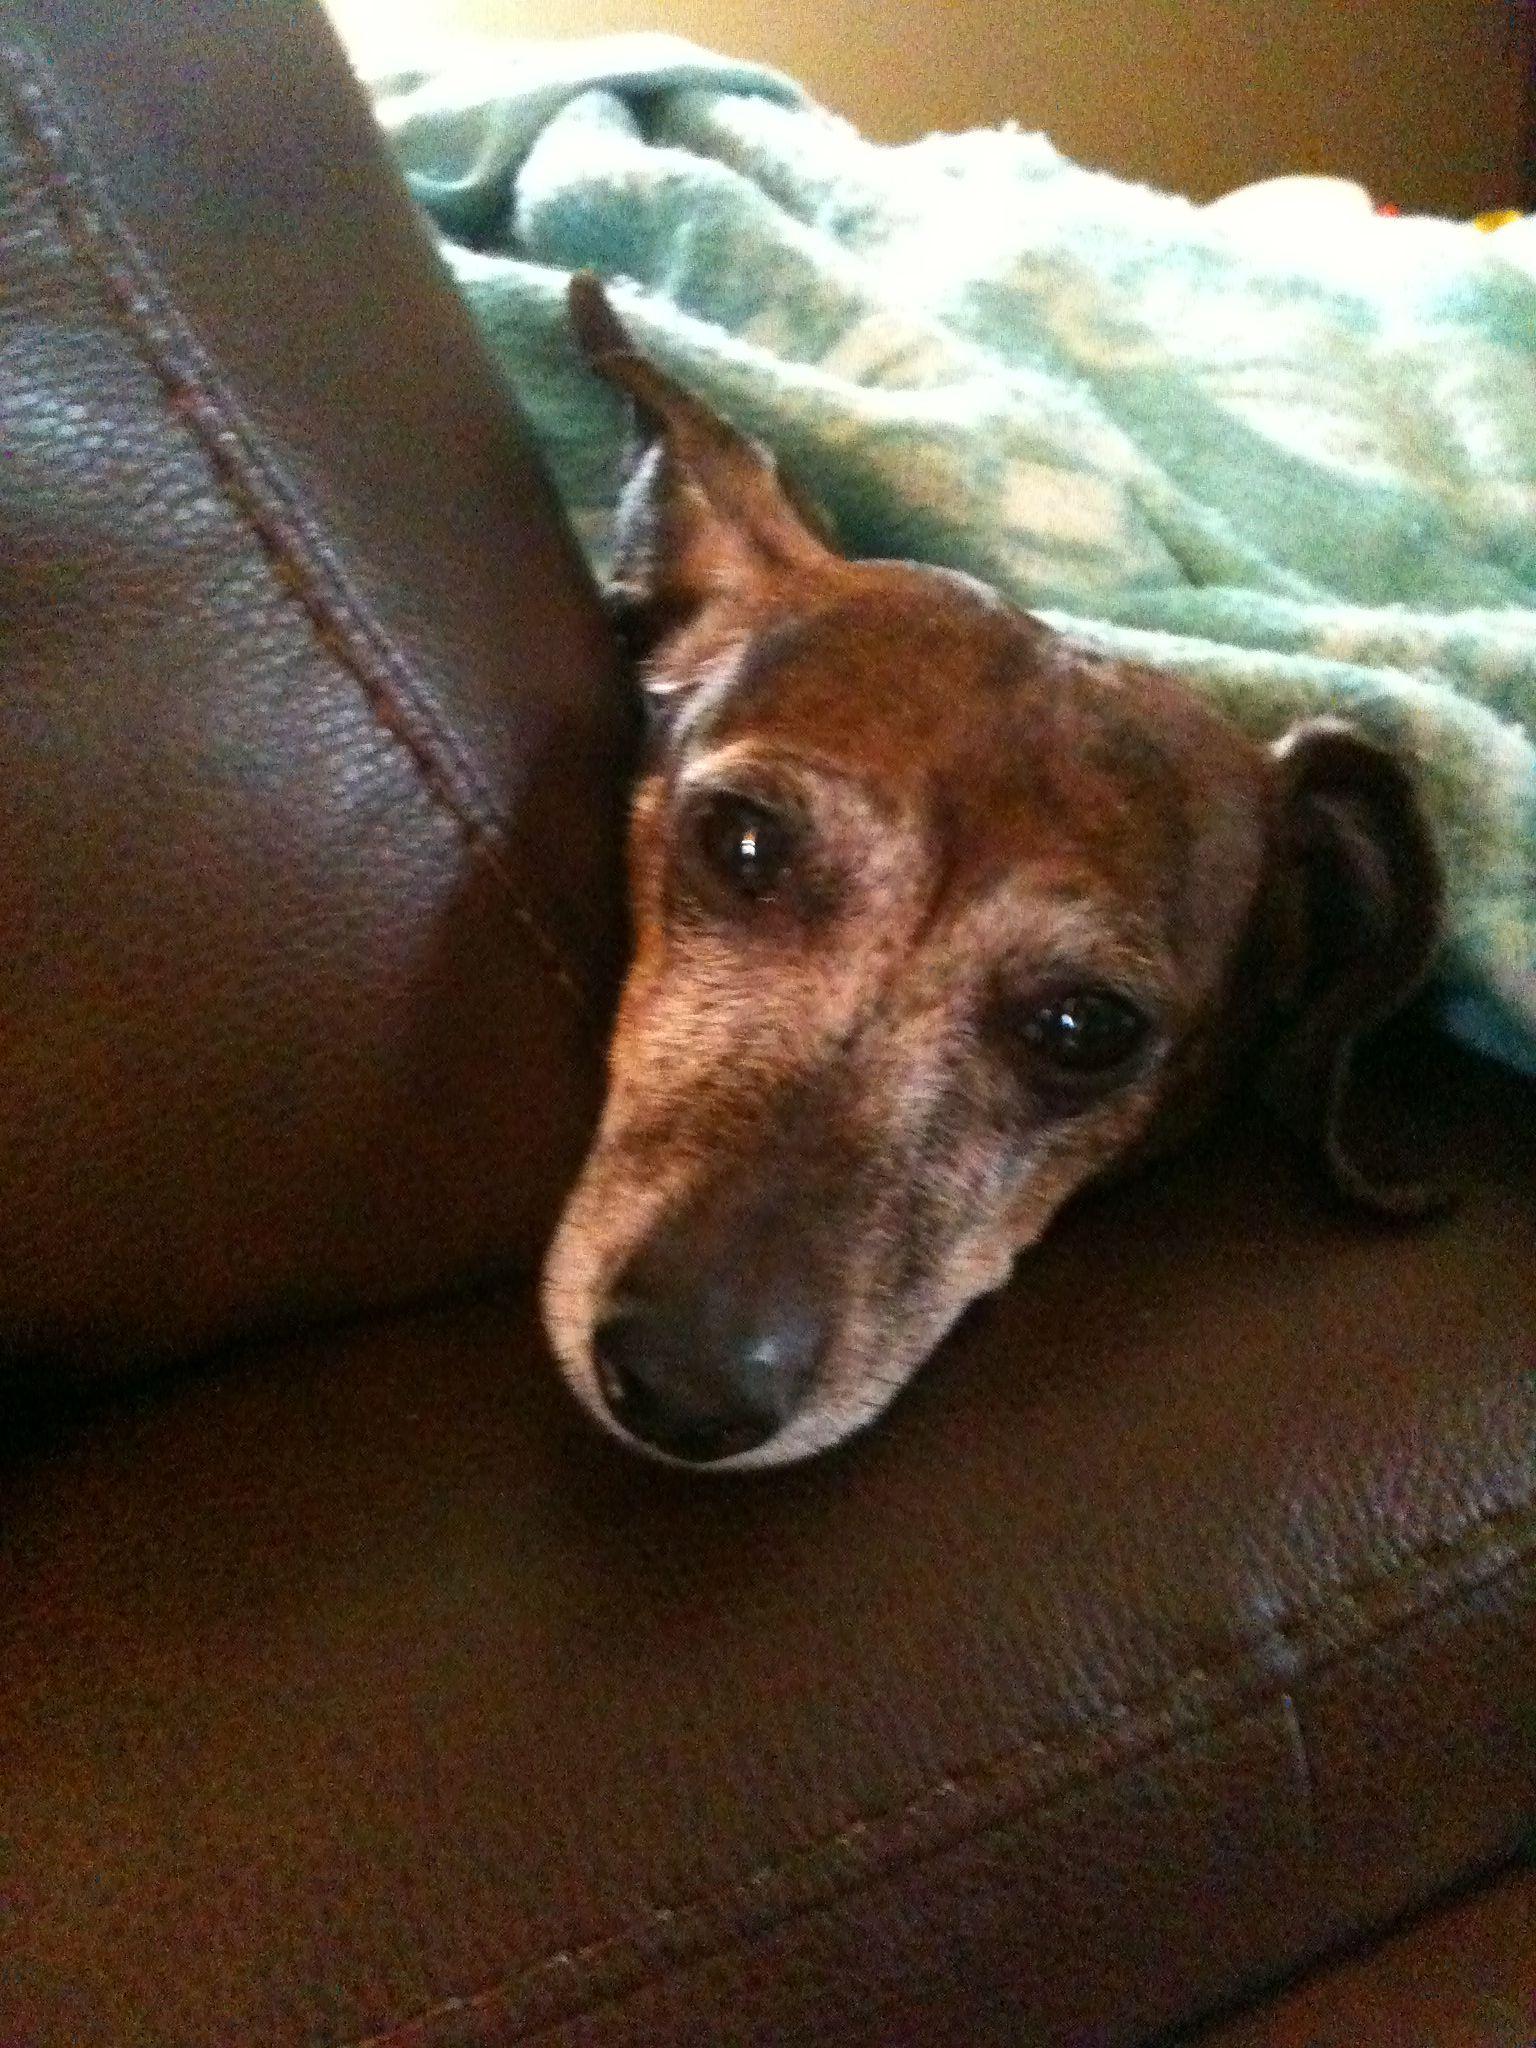 My dachshund | Dachshunds | Dachshund, Dogs, Spoiled rotten